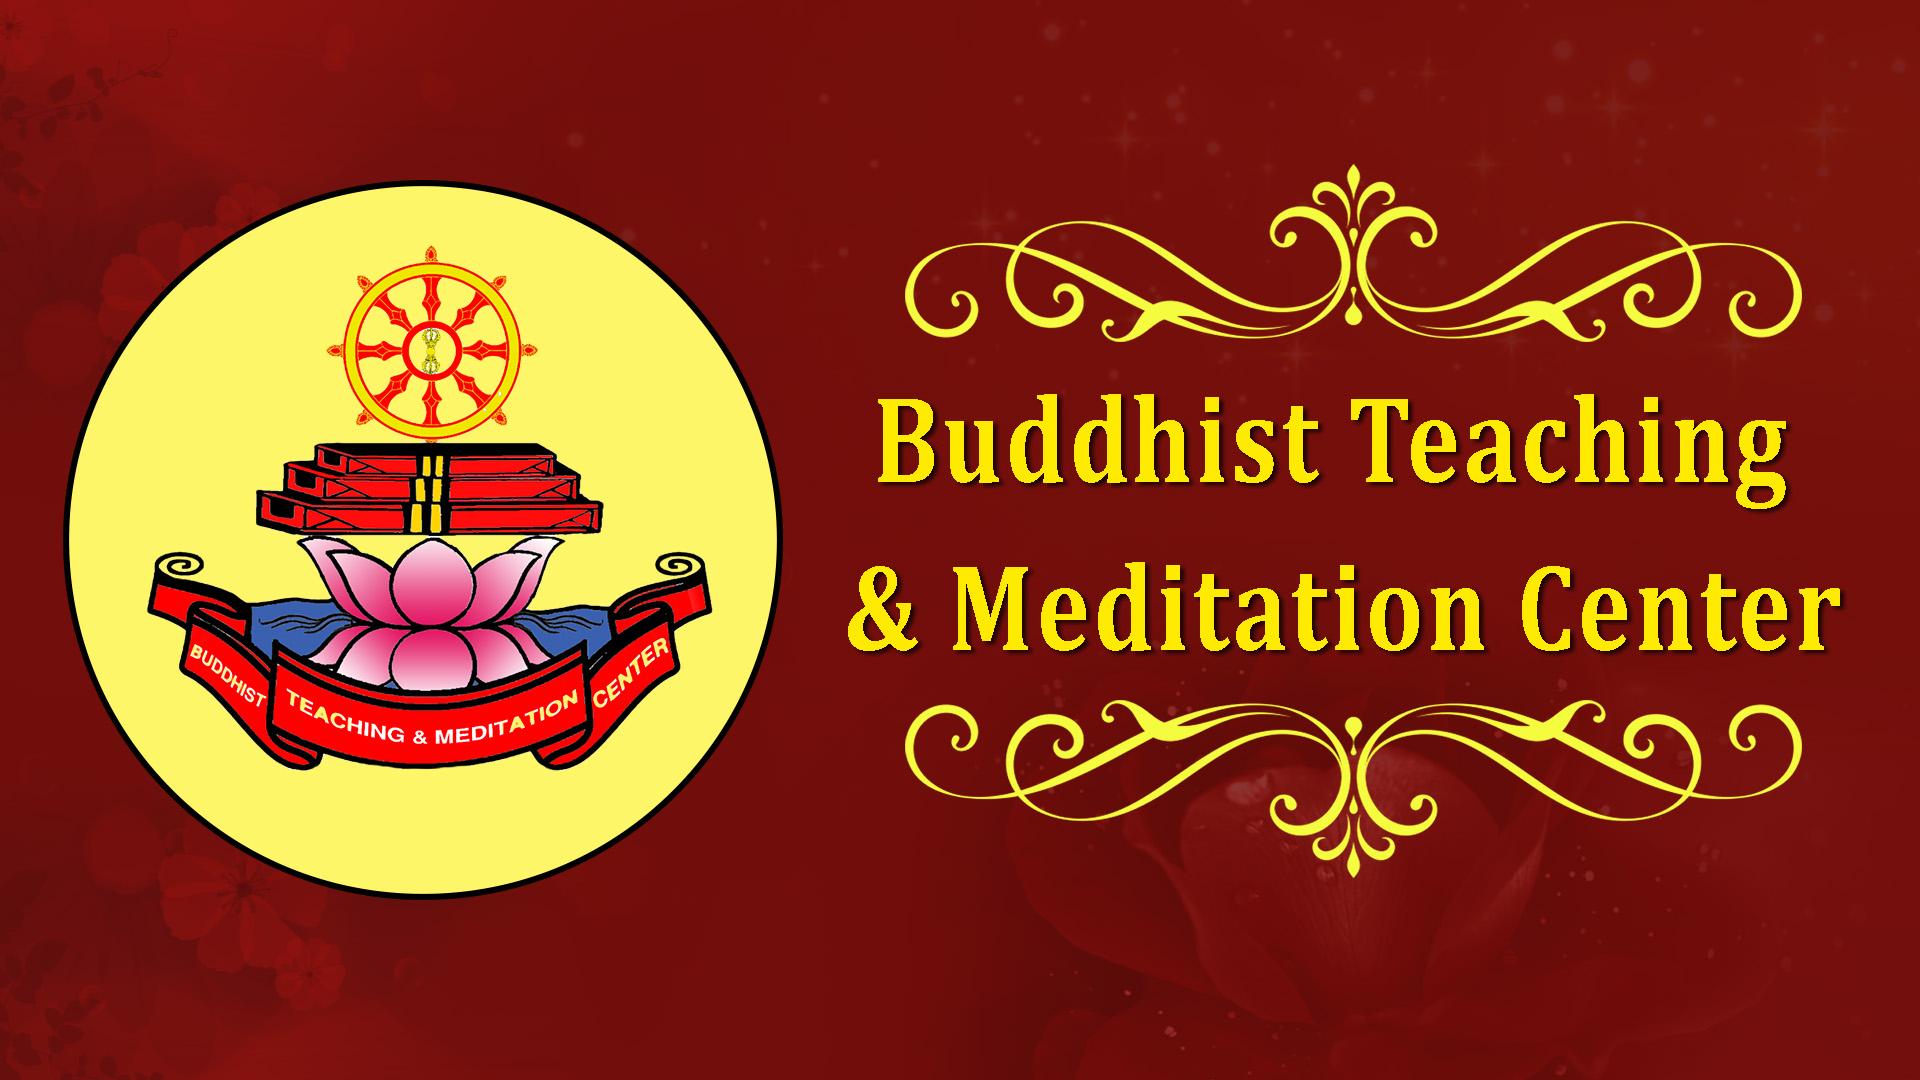 Buddhist Teaching & Meditation Center